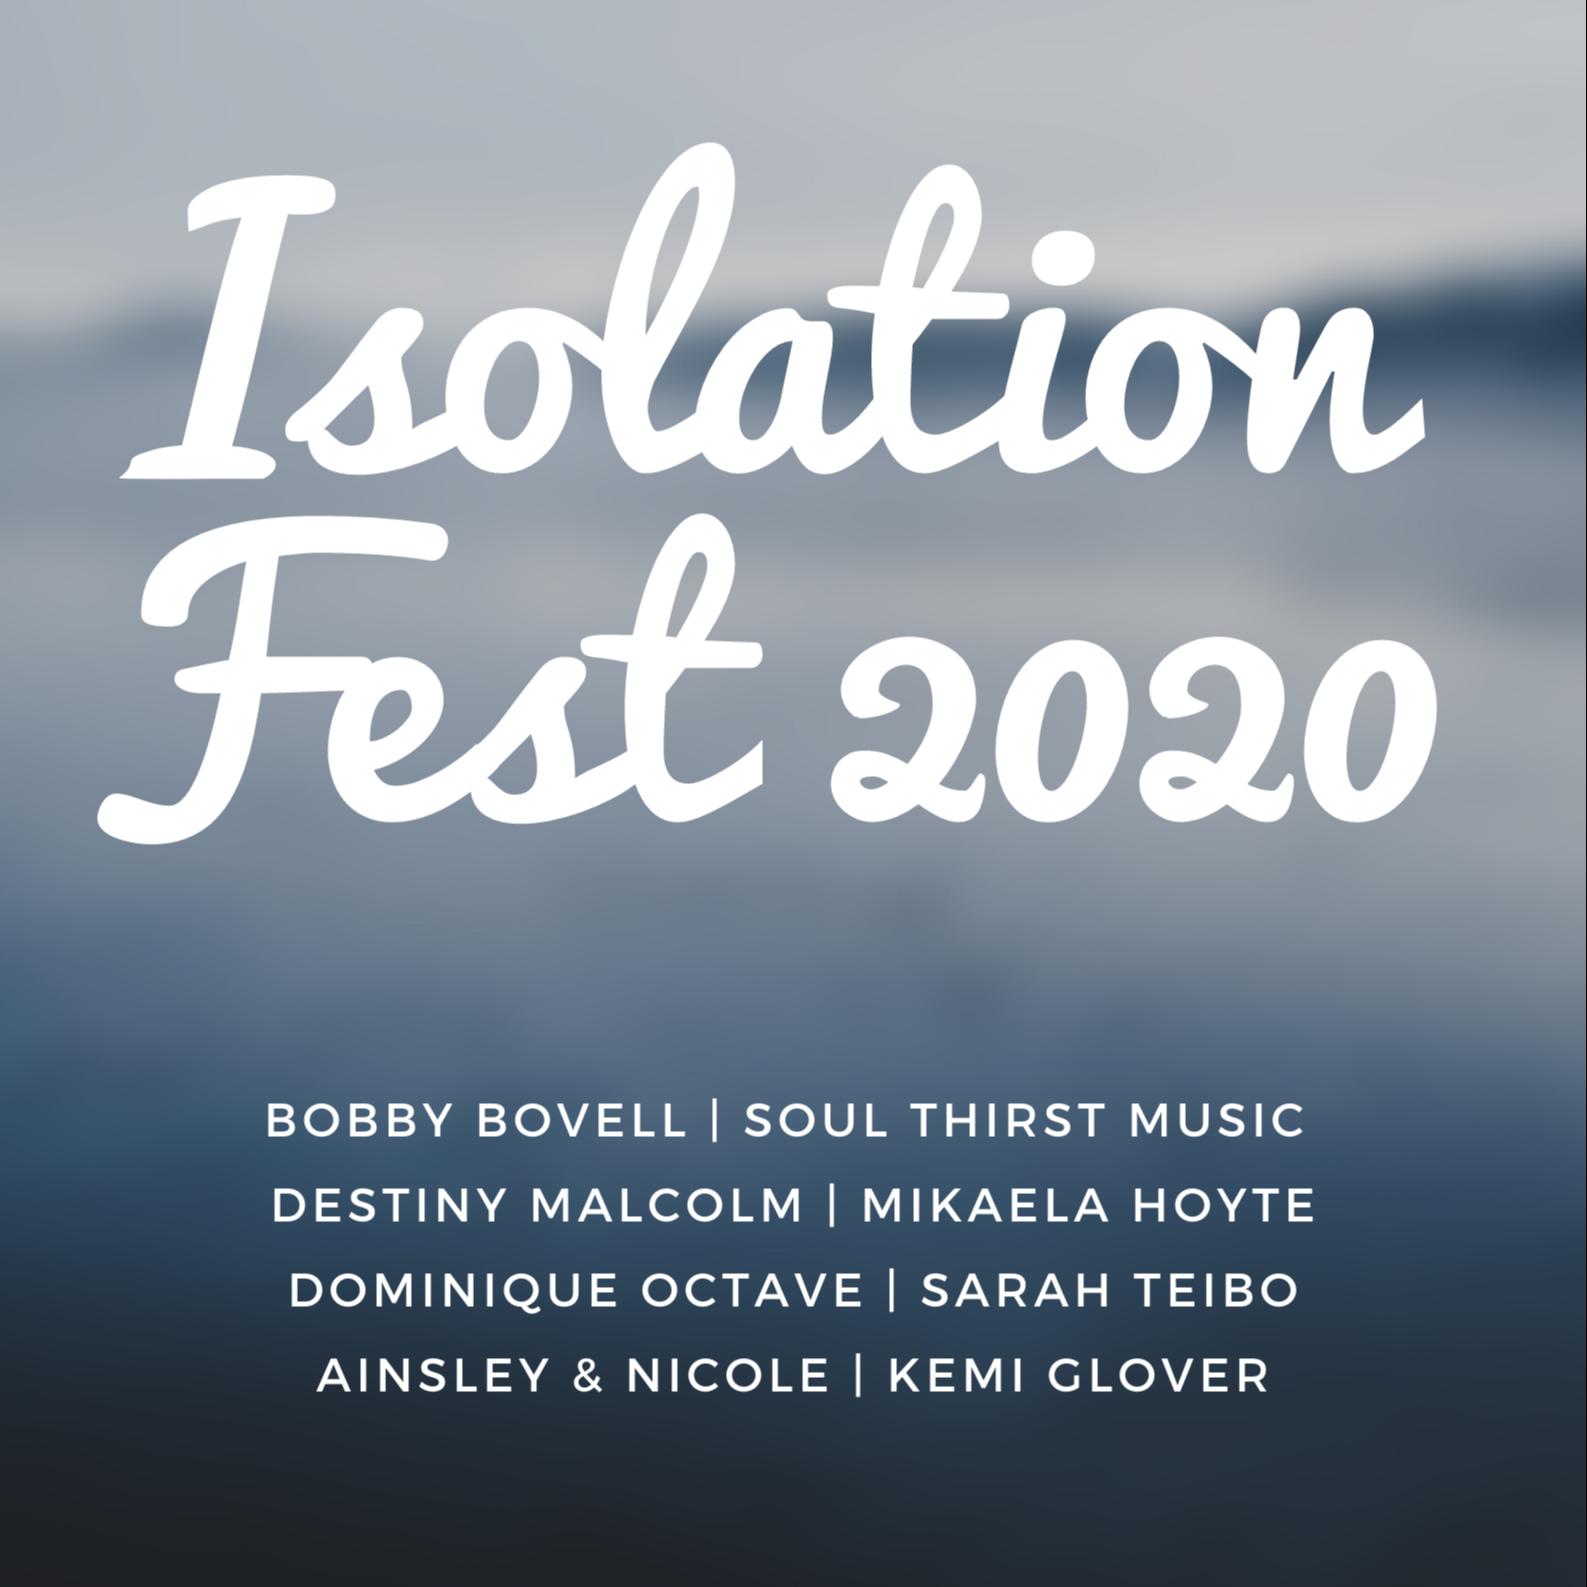 @isolationfest2020 Profile Image | Linktree